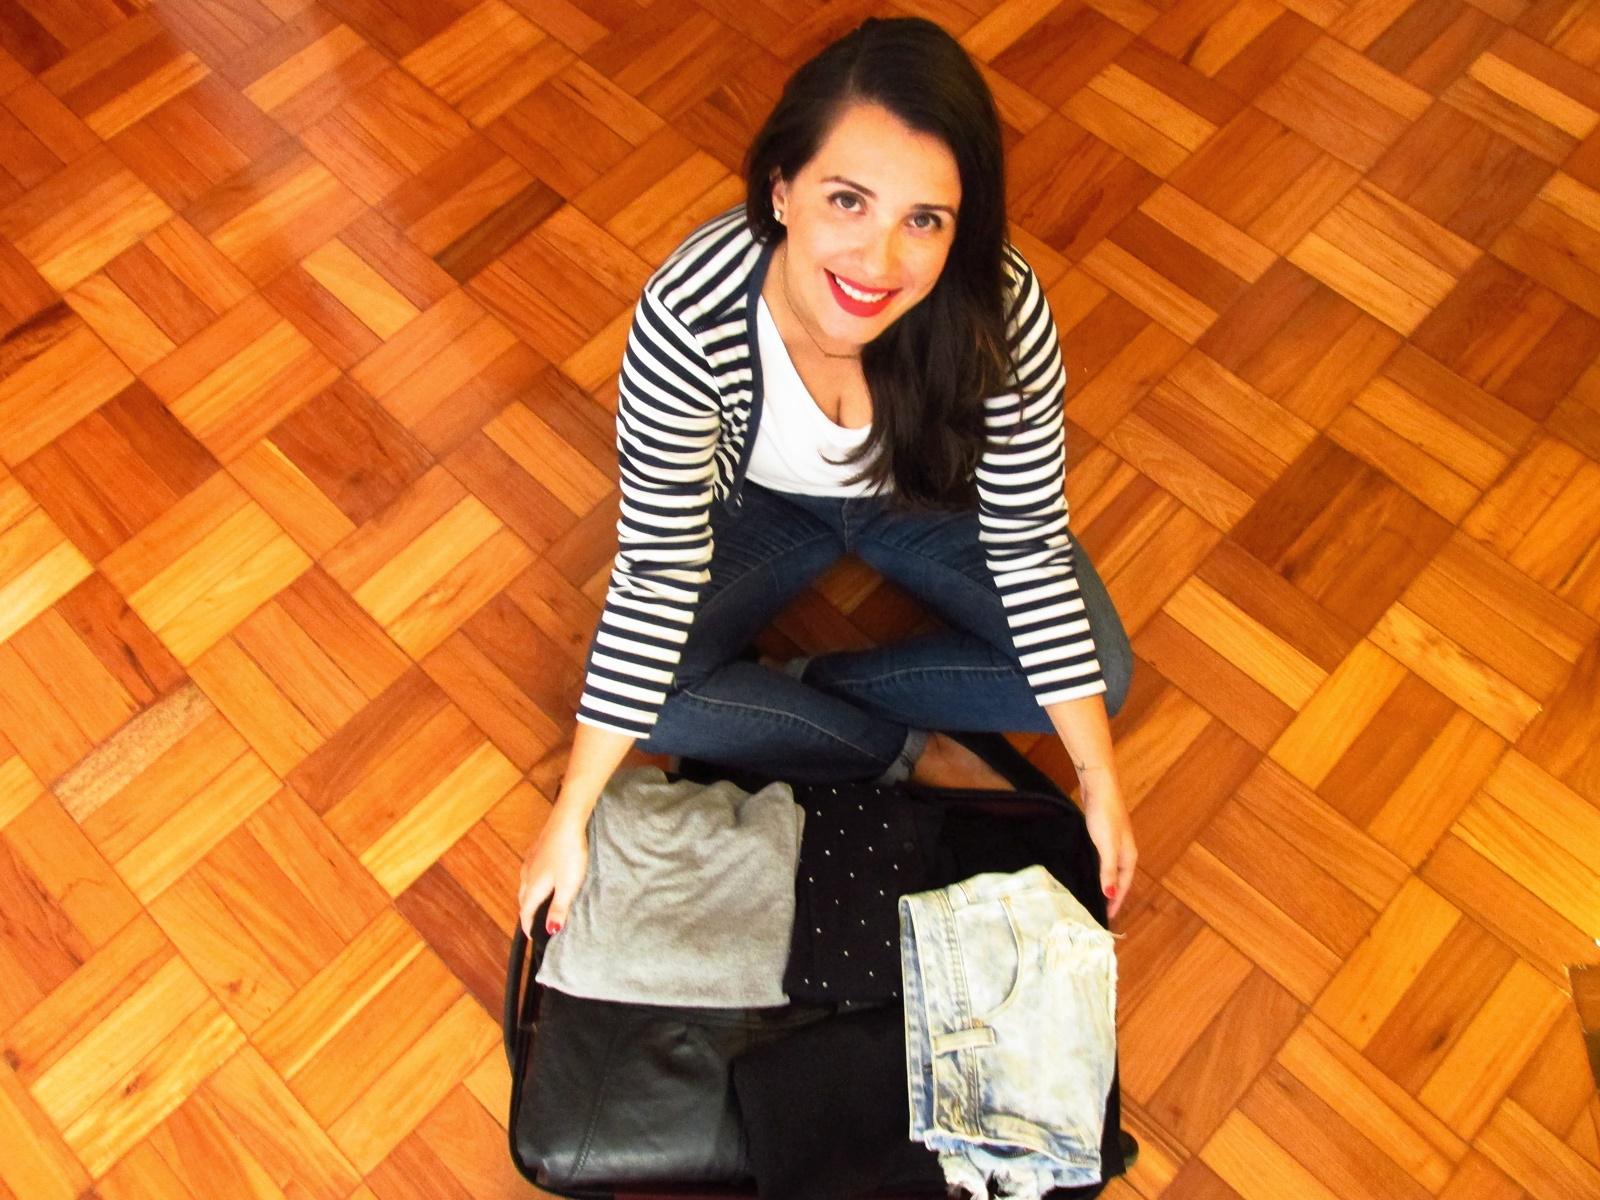 A catarinense Daniela Kopsch mostra a mala onde cabe todo o seu guarda-roupa de 50 peças: 25 blusas, 8 vestidos, 8 casacos, 4 calças, 3 shorts e 2 saias